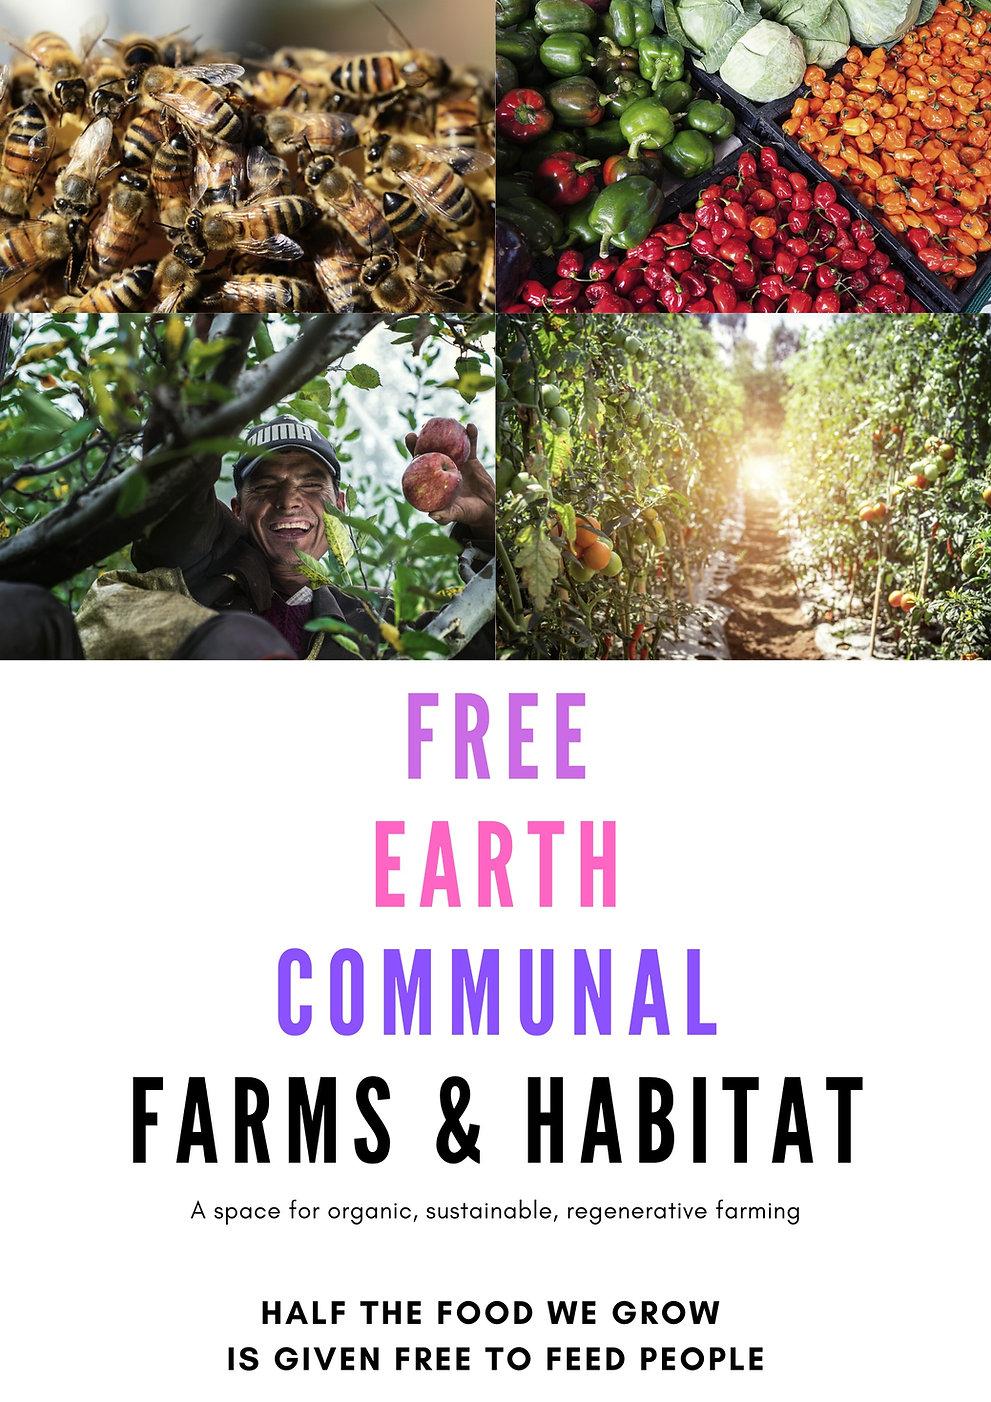 Free Earth Farm.jpg